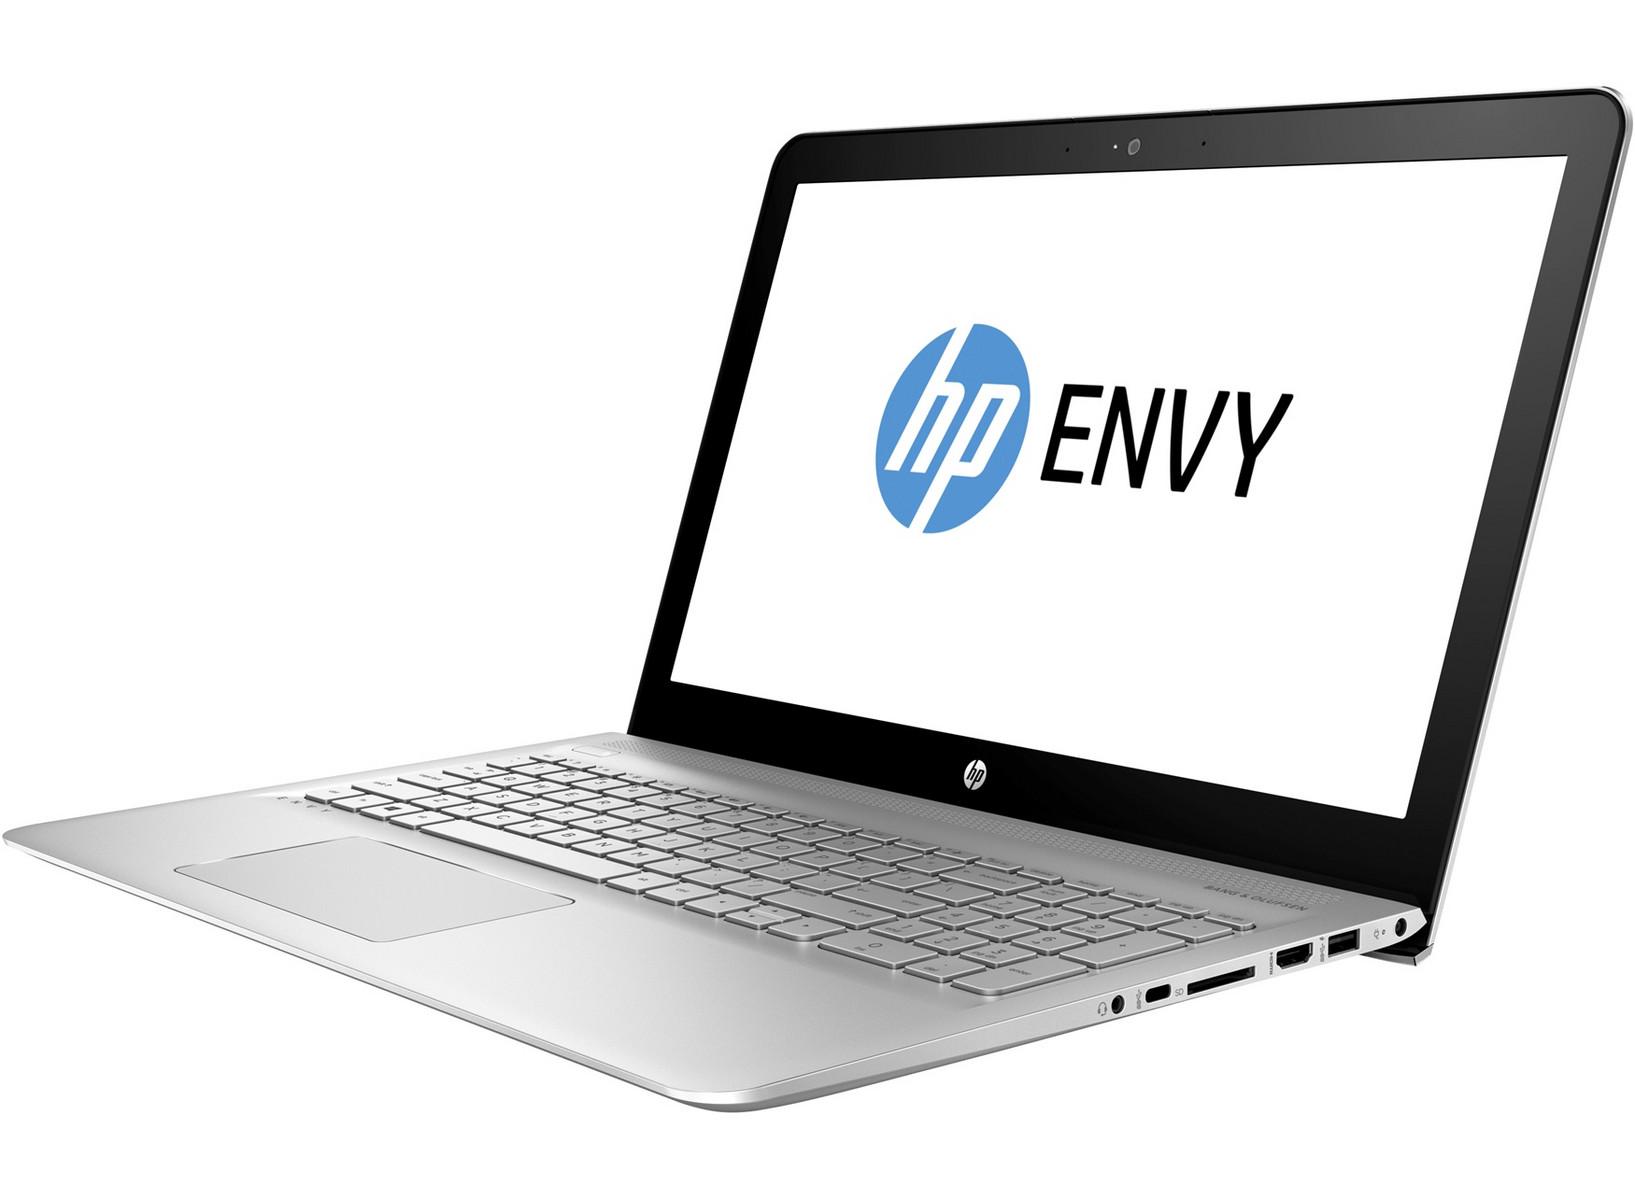 Hp Envy 15 As001na Notebookcheck Net External Reviews